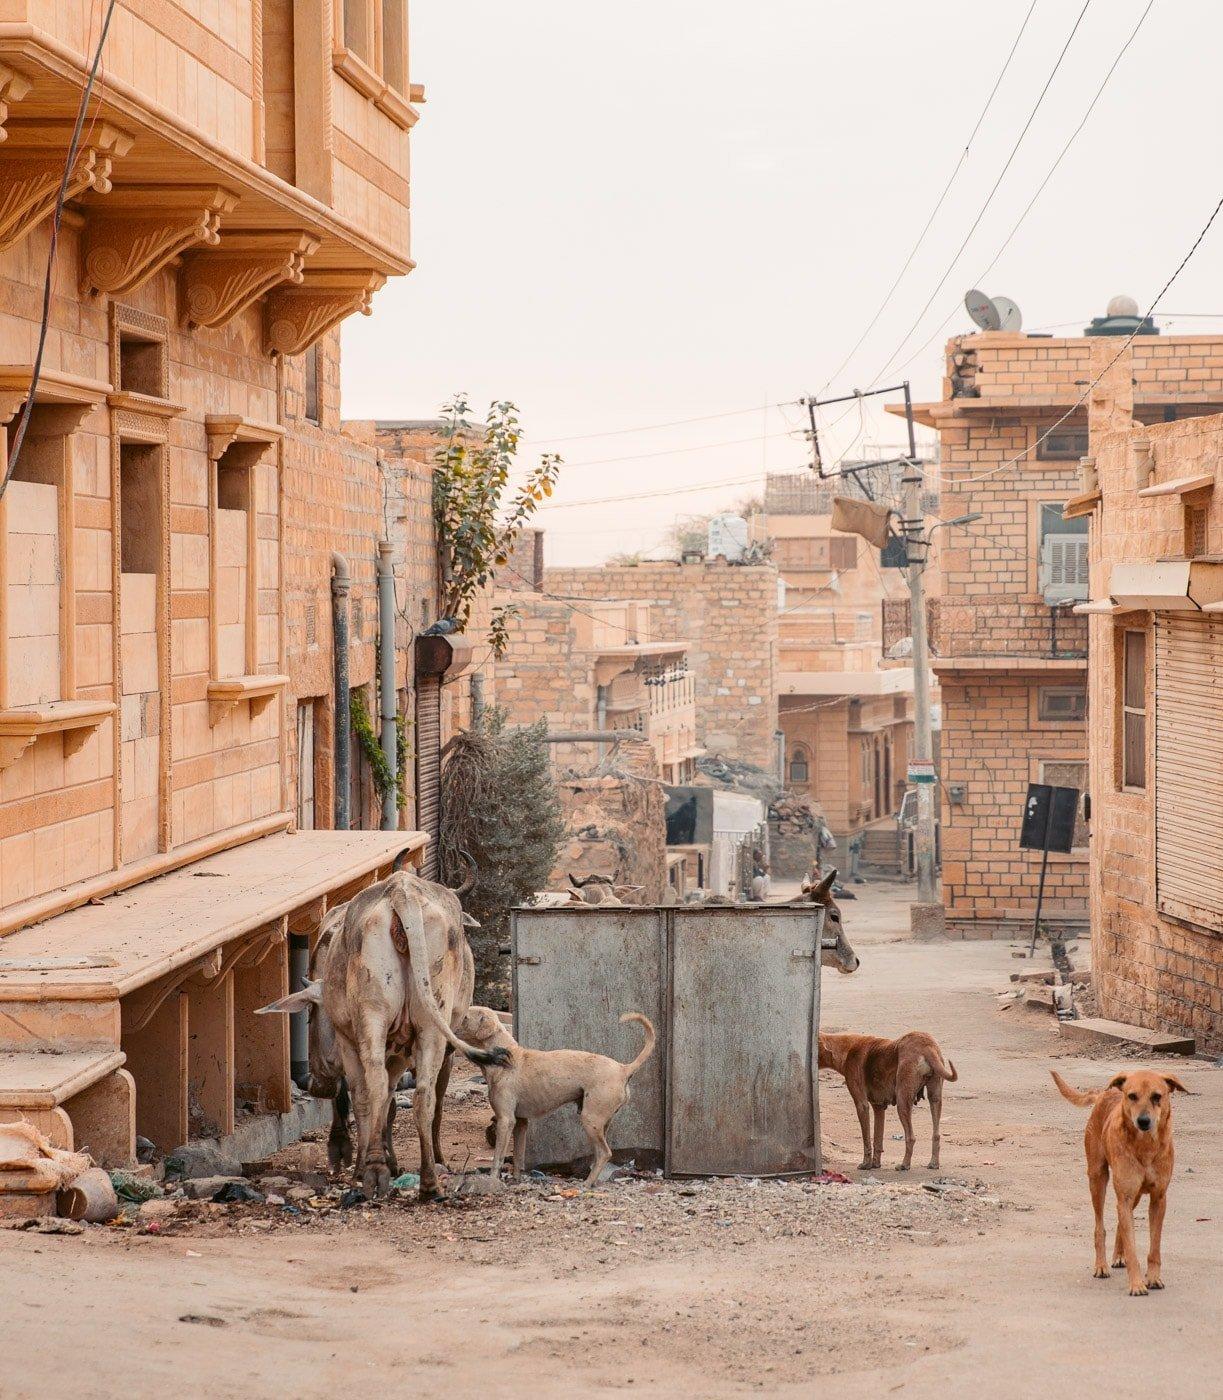 STREETS OF JAISALMER INDIA